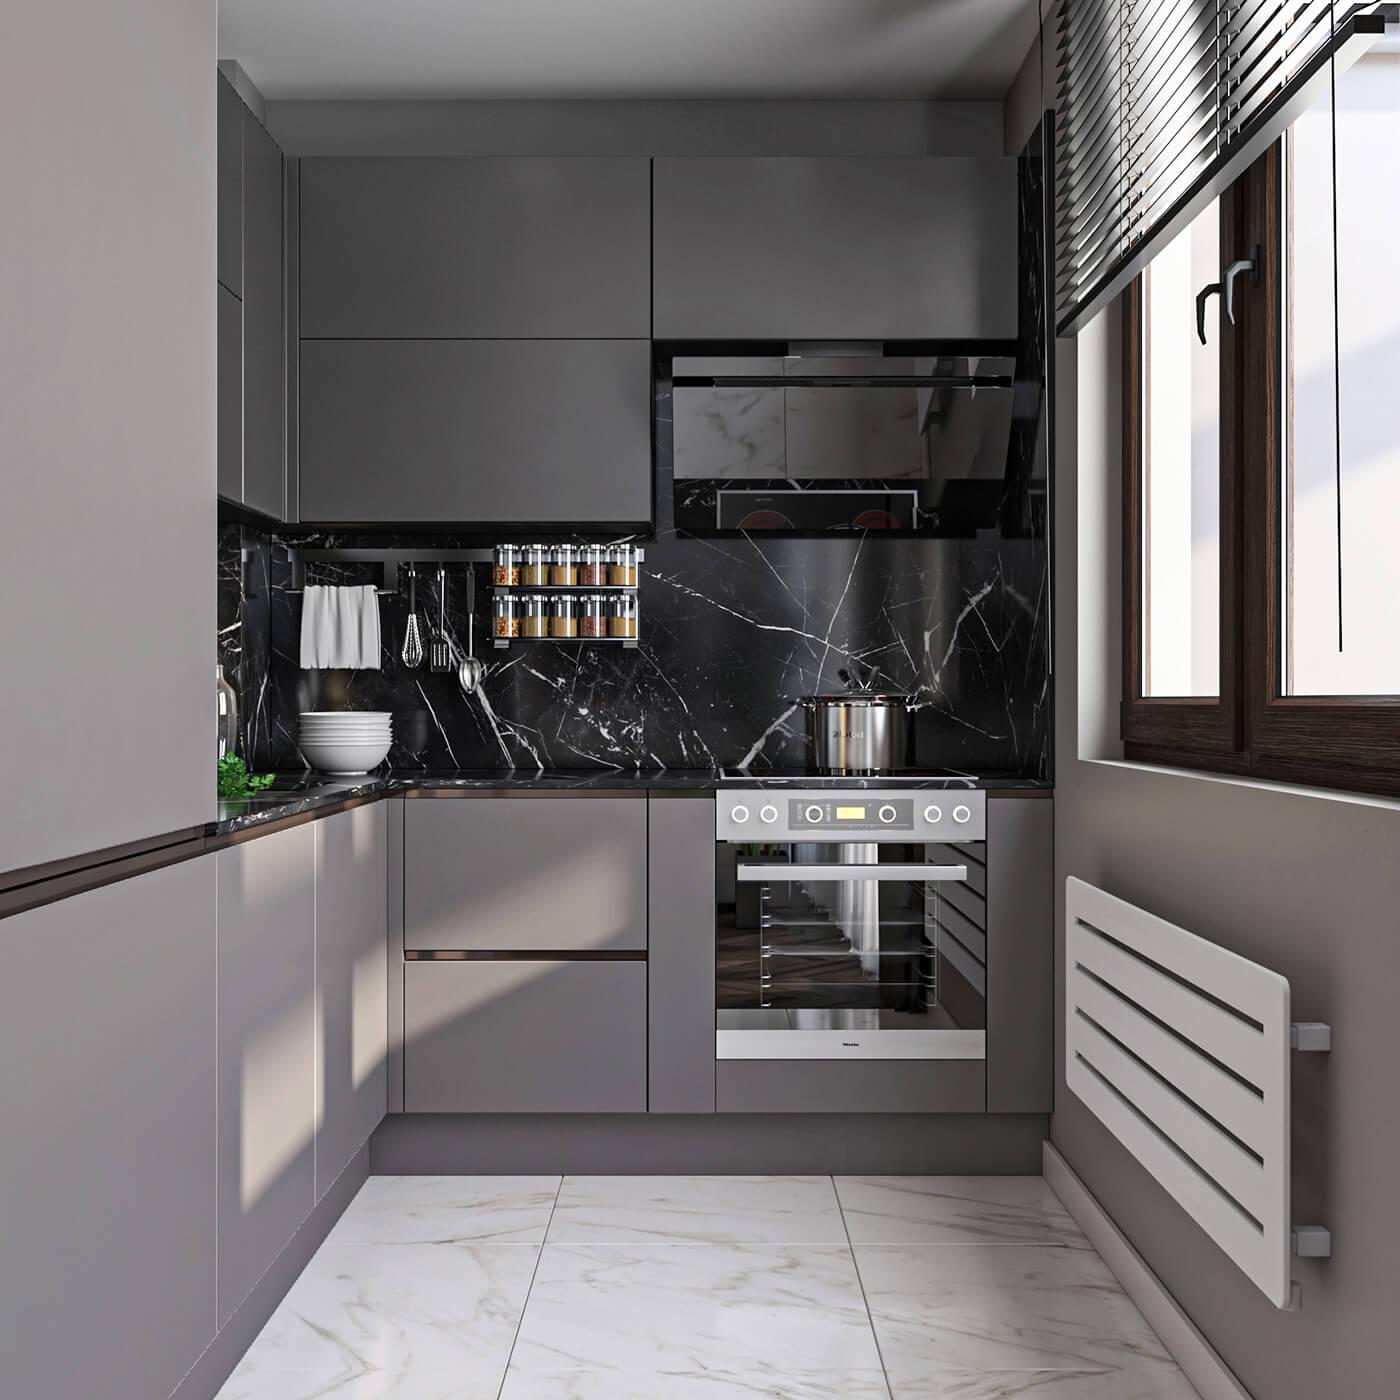 interioren-dizain-proekt-na-kuhnia-marquise